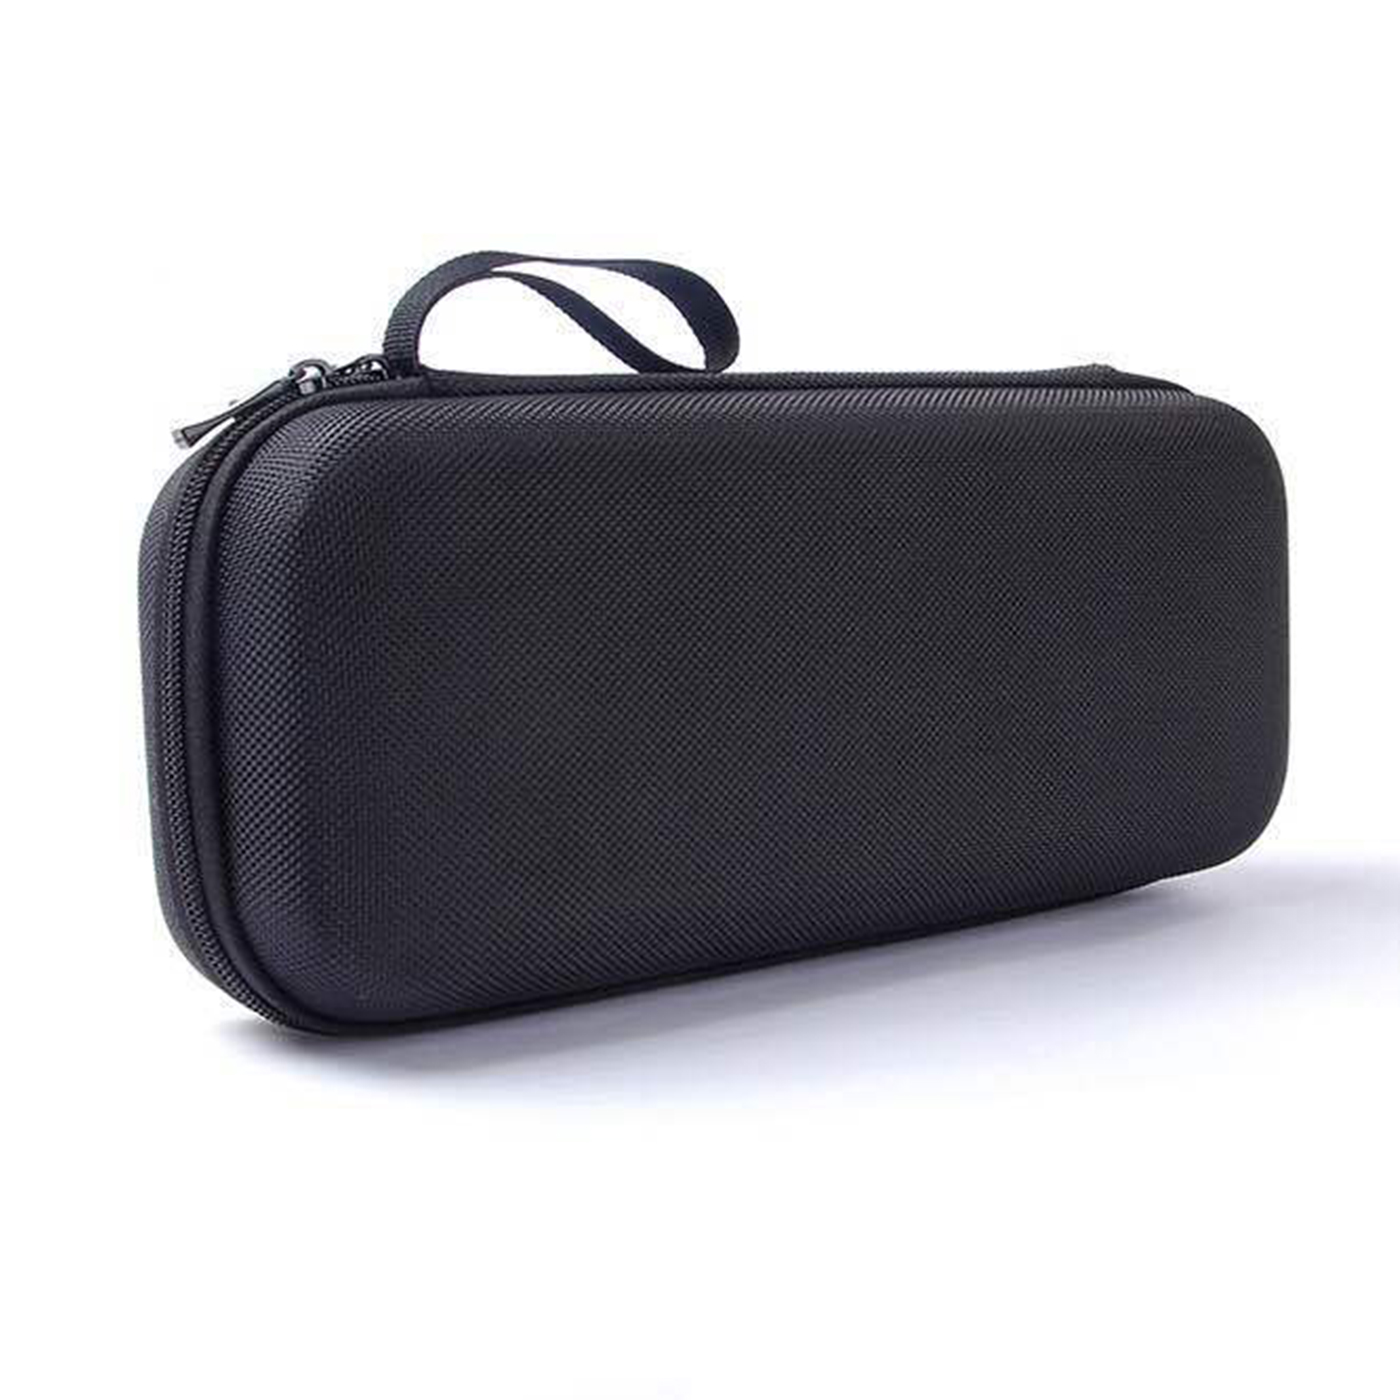 Image 4 - Stethoscope Case Stethoscope Bag Portable Travel EVA Storage Bag  for Stethoscope Accessories Medical Kit Medical EquipmentStethoscope